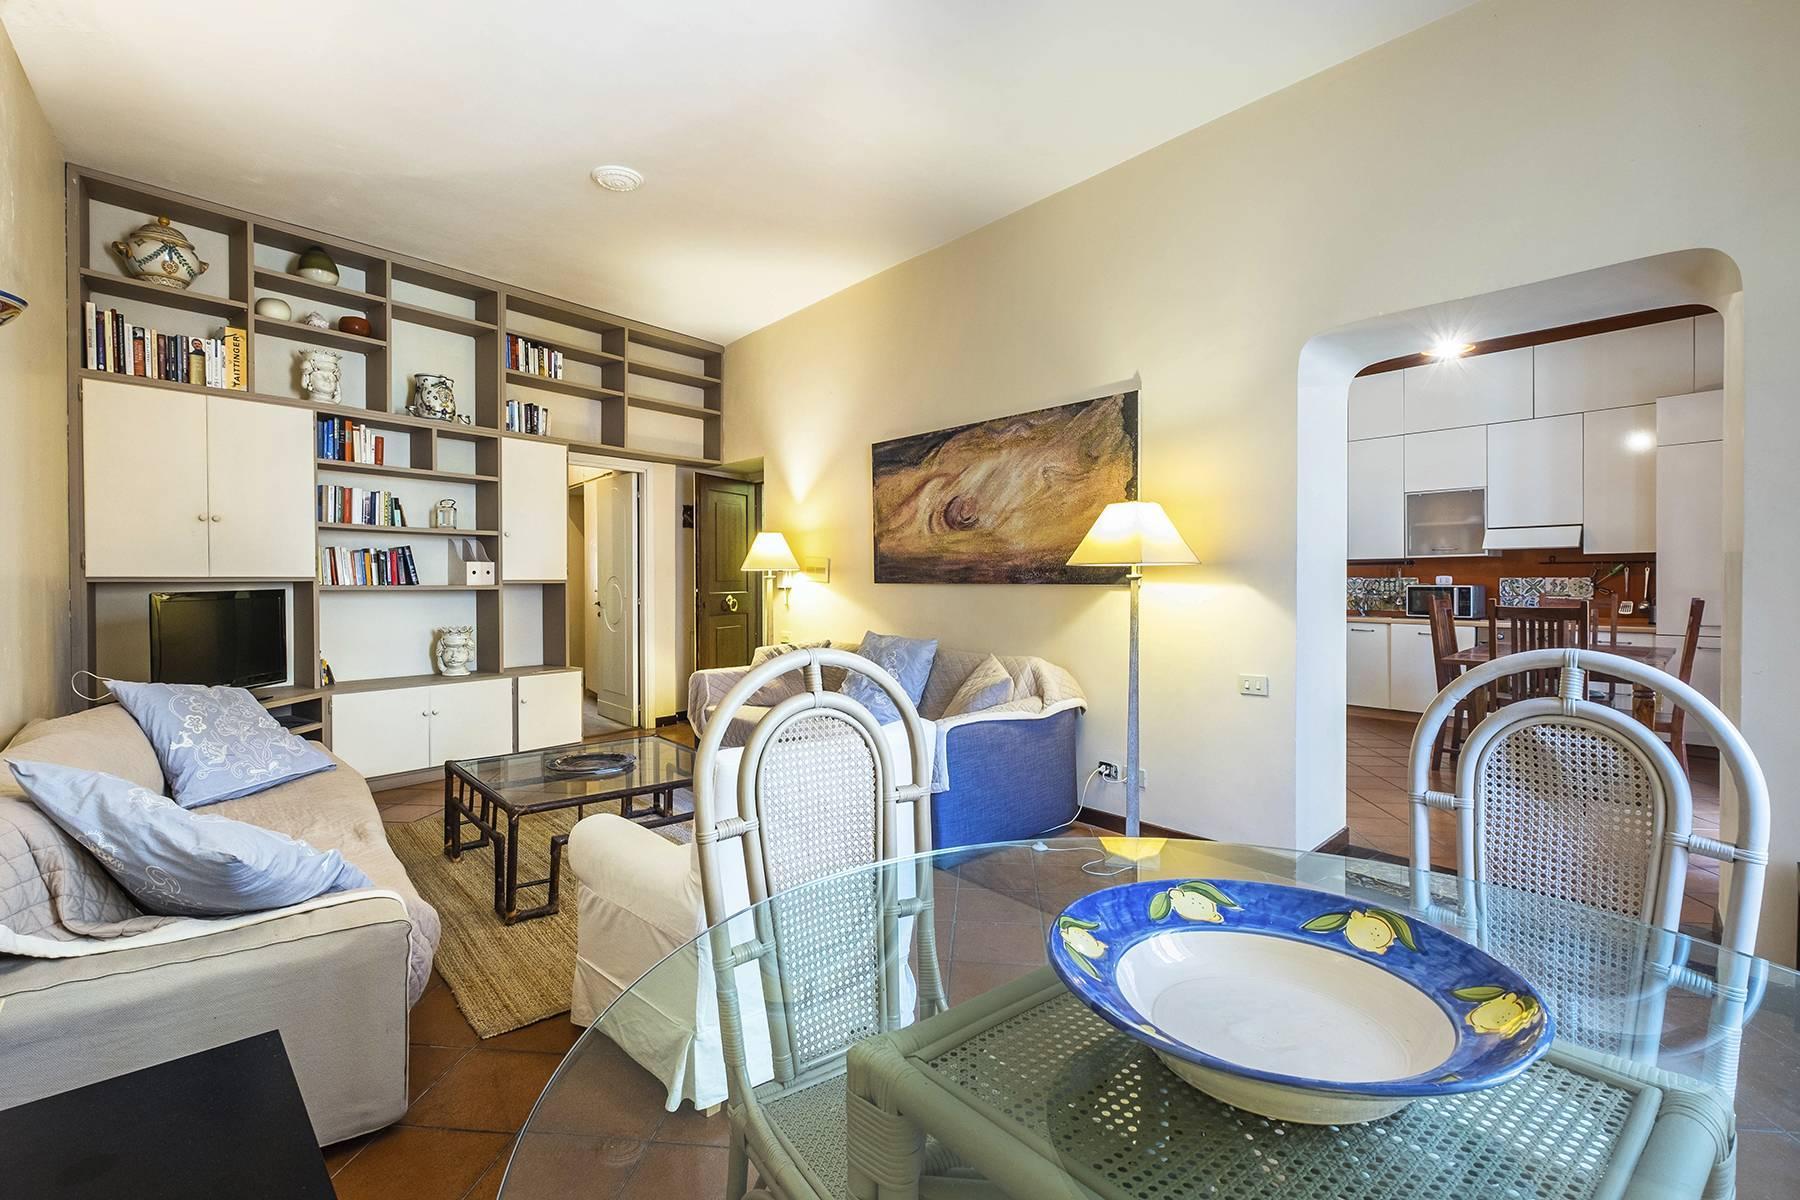 Affascinante appartamento a due passi dal Palatino - 3